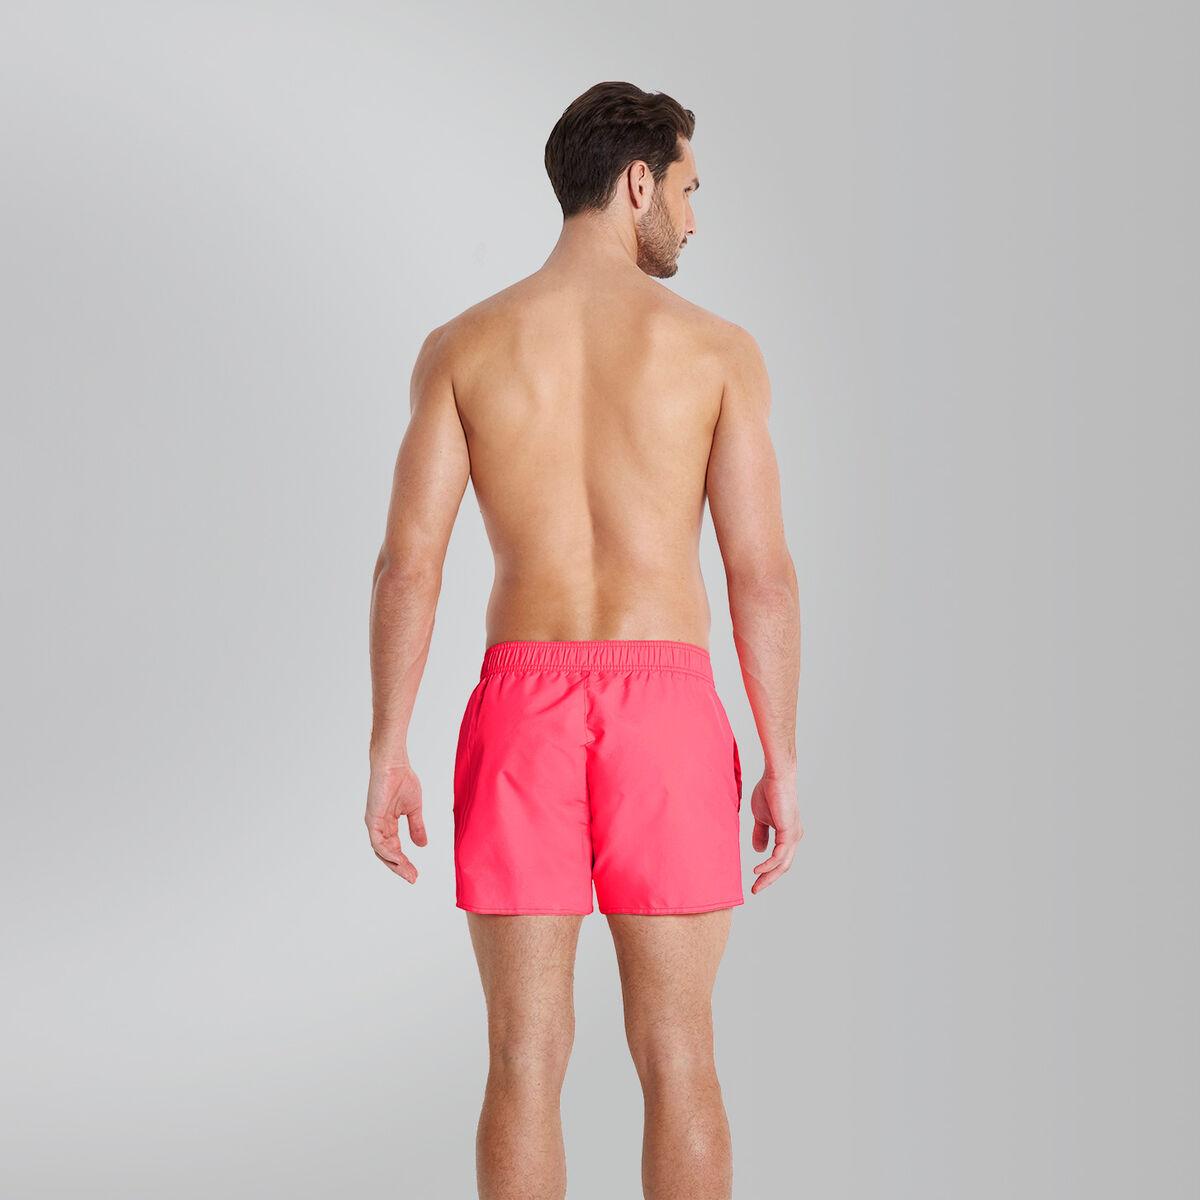 Retro Leisure Swim Shorts